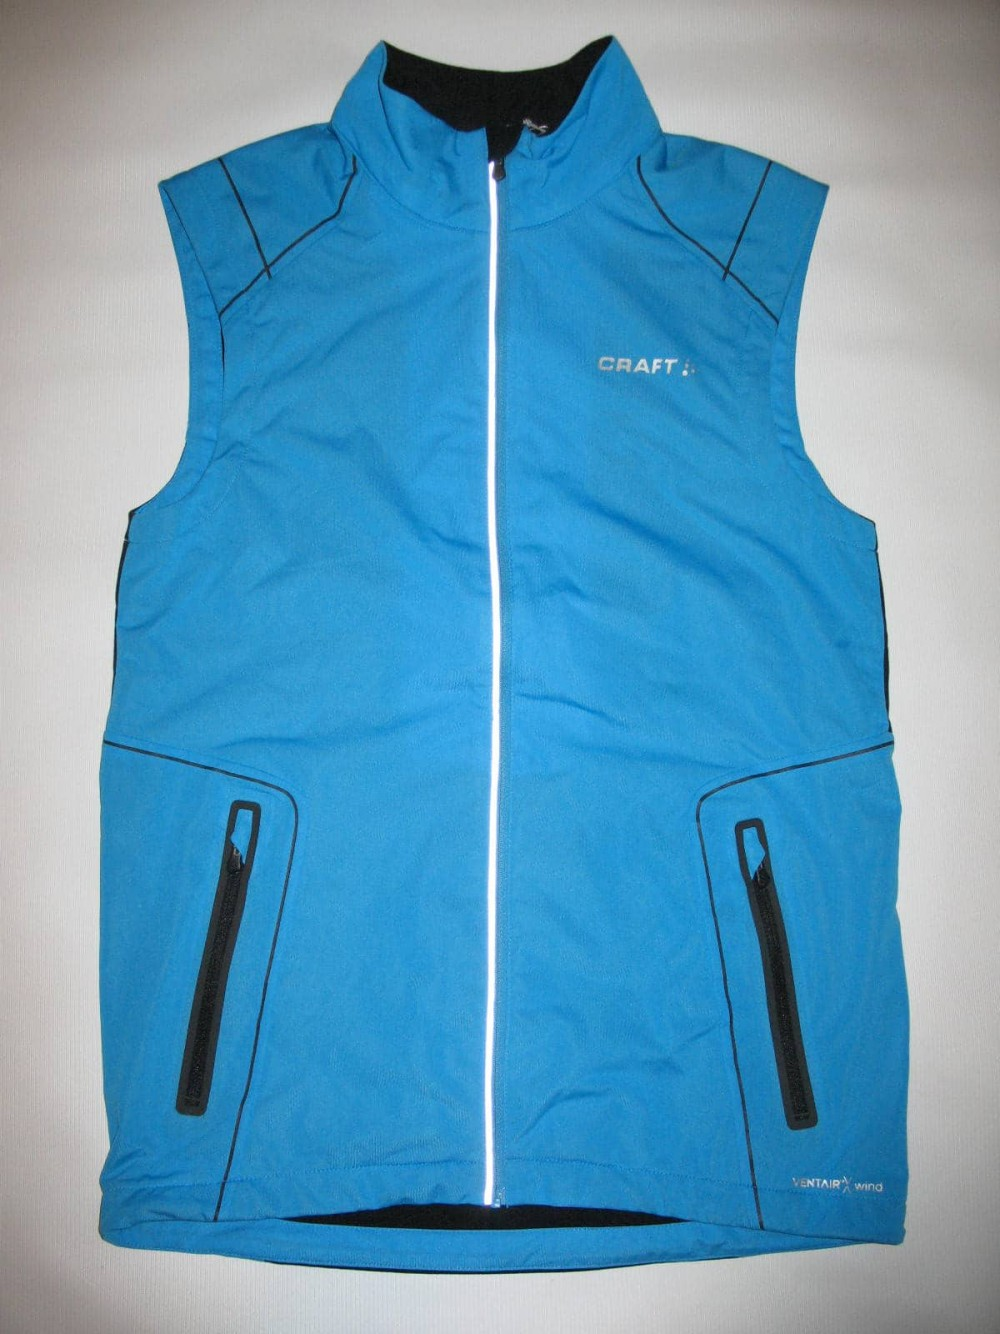 Жилет CRAFT pxc high function softshell vest (размер XS/S) - 1